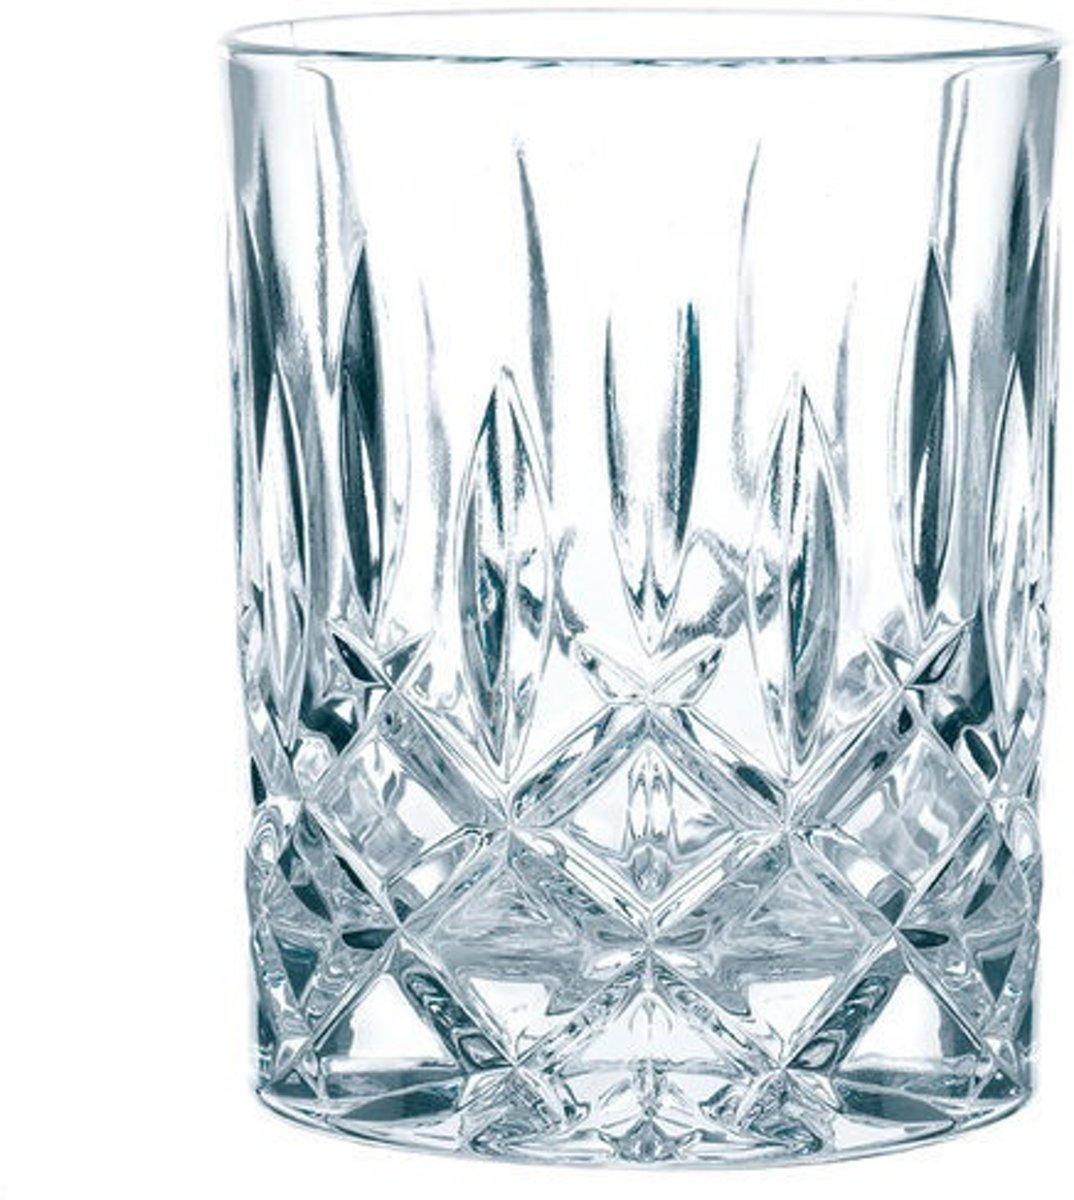 Nachtmann Noblesse Whiskeyglas - 4 stuks kopen